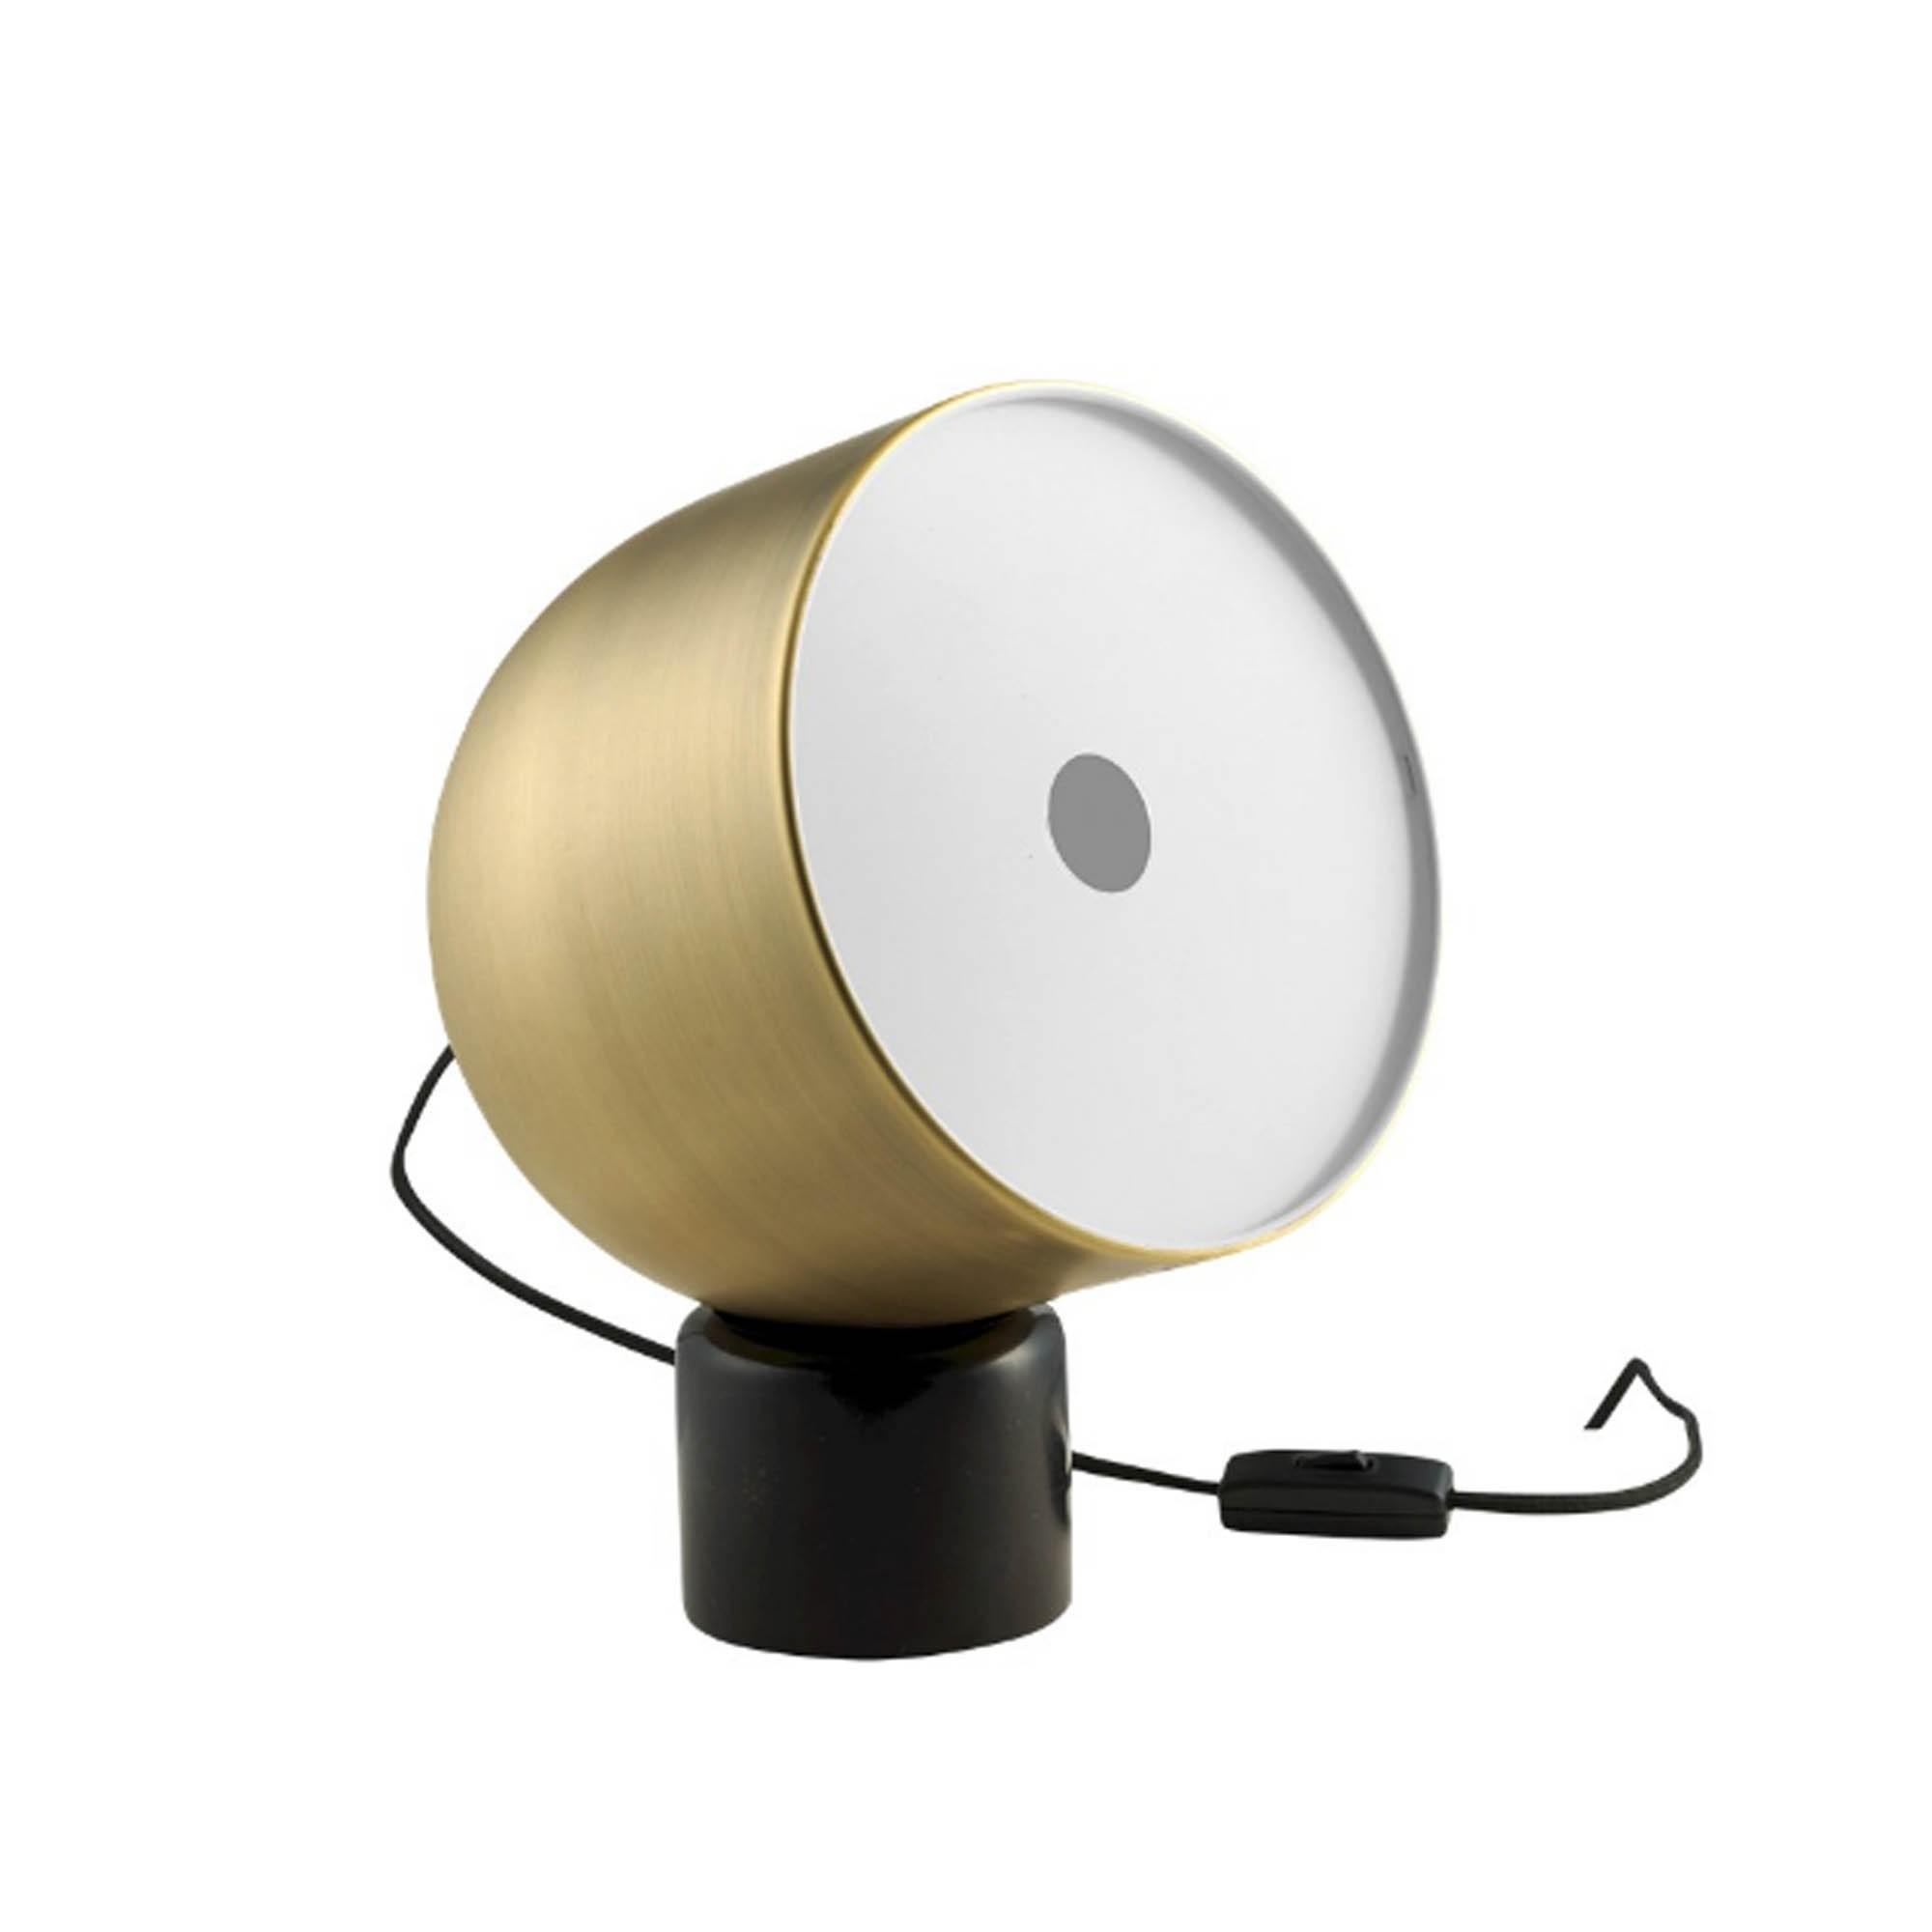 lampe de table faro dore Résultat Supérieur 60 Beau Lampe Cloche Galerie 2018 Hdj5